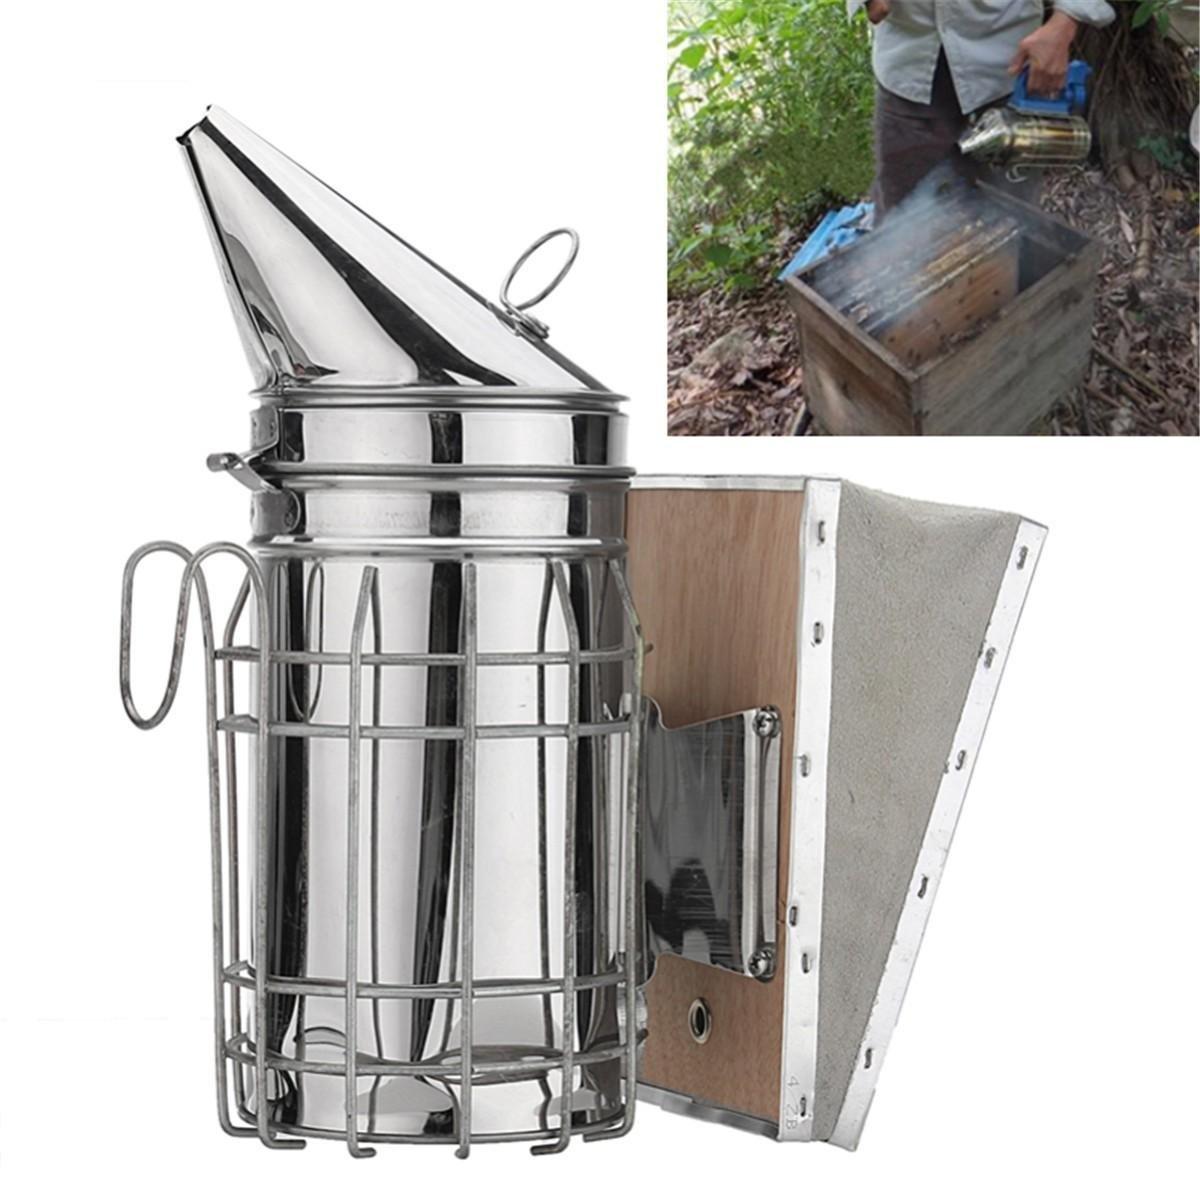 Galvanized Sheet Bee Hive Smoker with Heat Shield Beekeeping Equipment